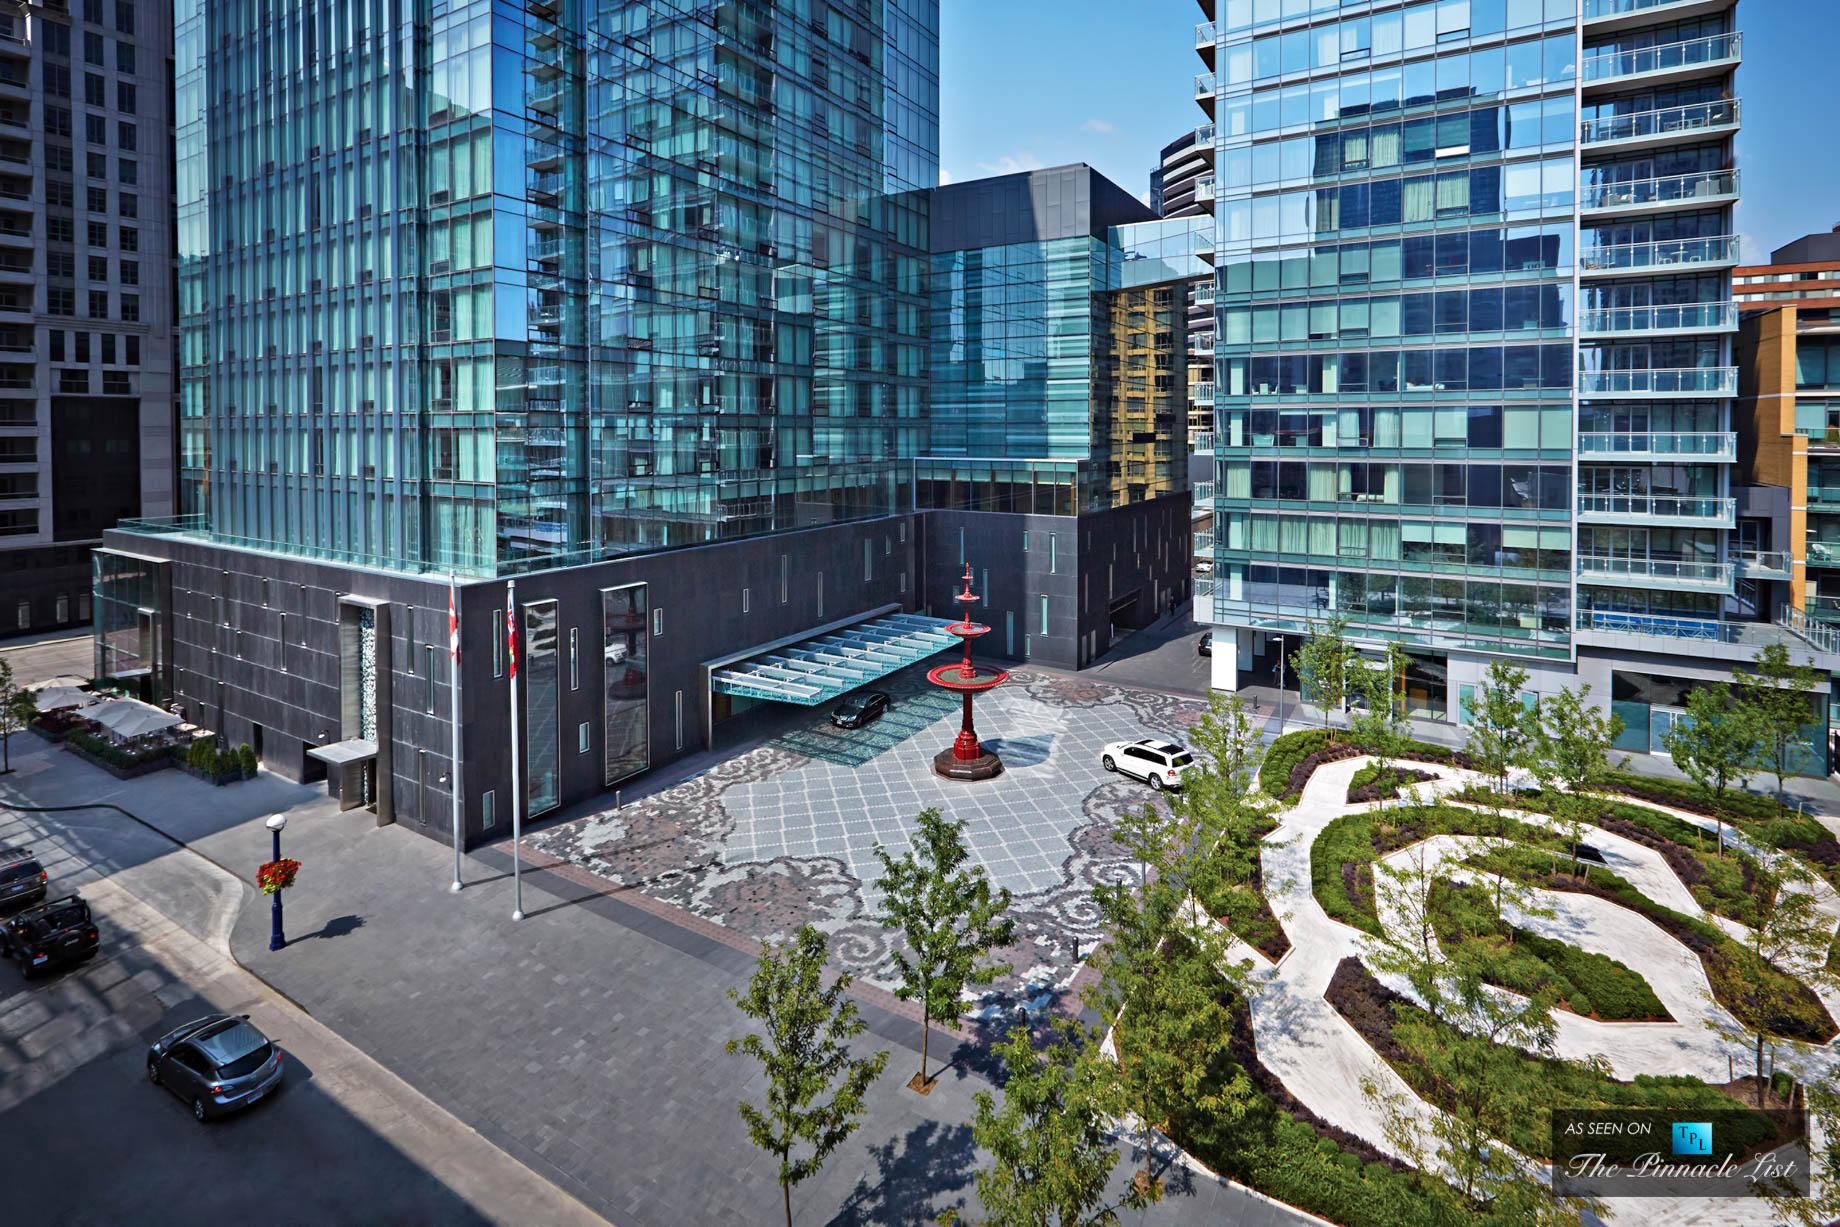 The Four Seasons Residences - Luxury Condo Residences - Toronto, Ontario, Canada